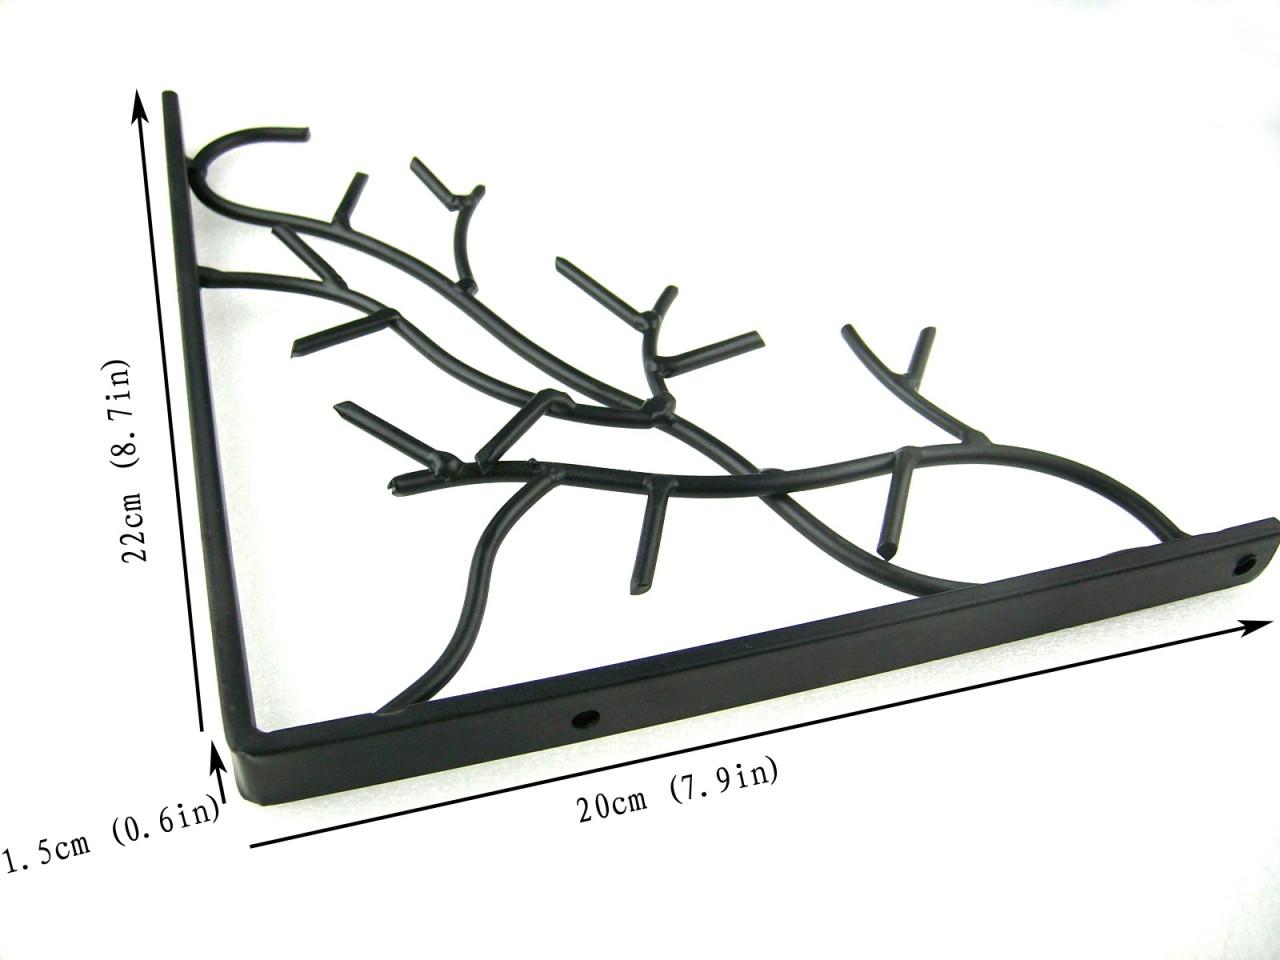 Pair Of Iron Metal Branch Decorative Wall Shelf Brackets